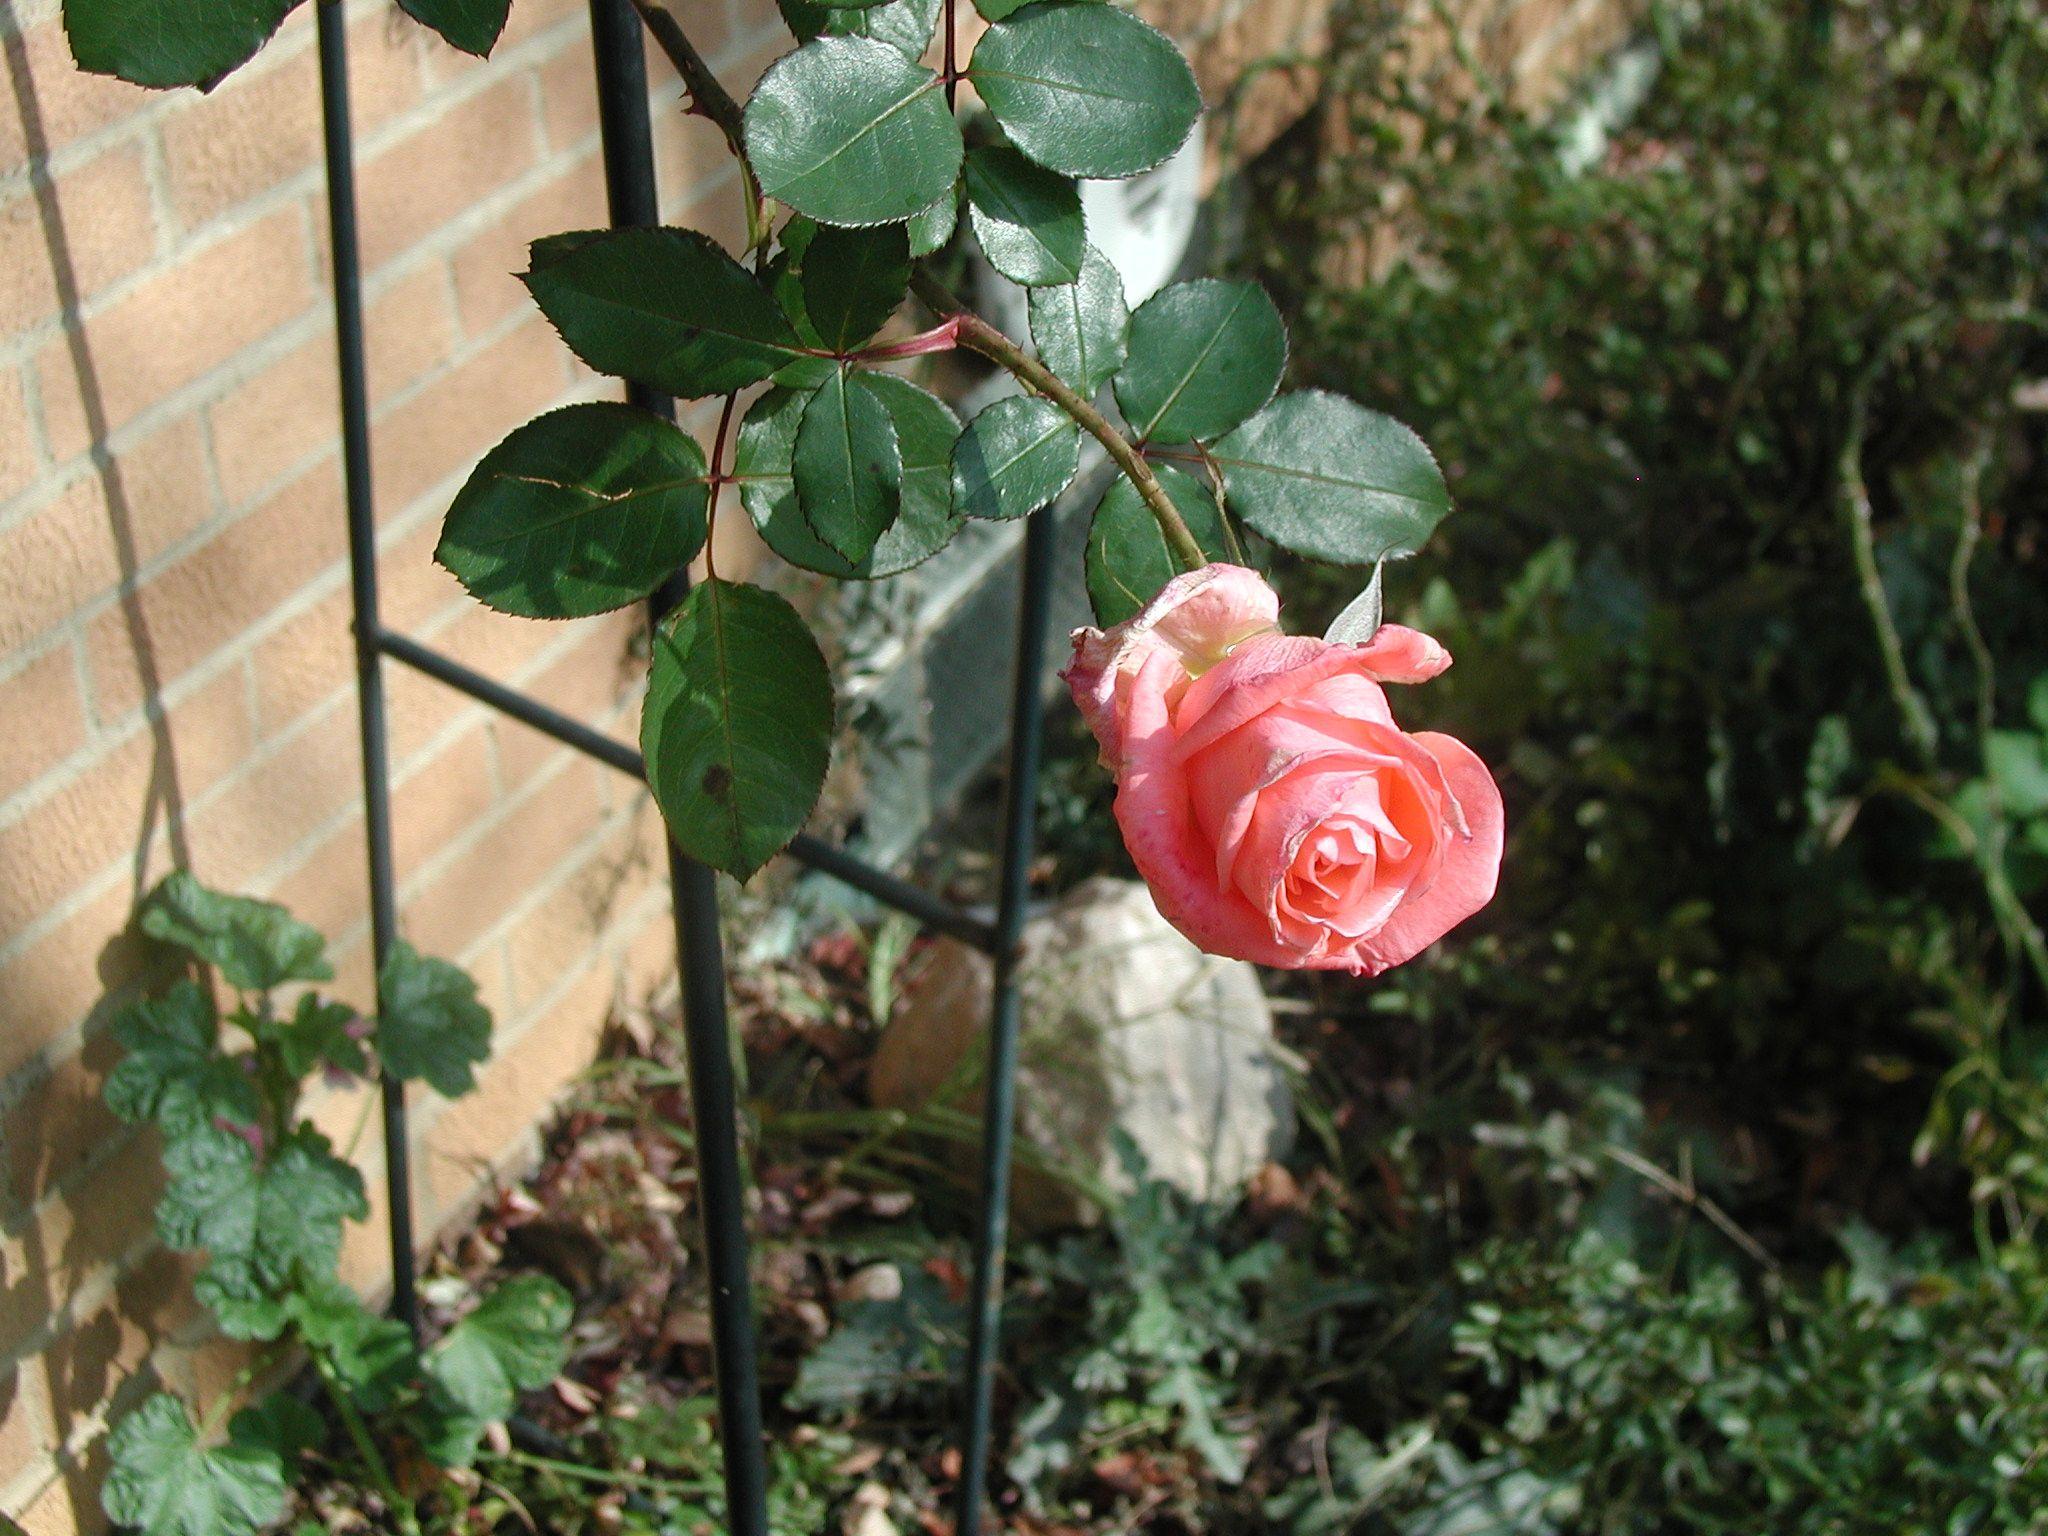 Sonia Rose Blooming November 2012 in My Back Yard